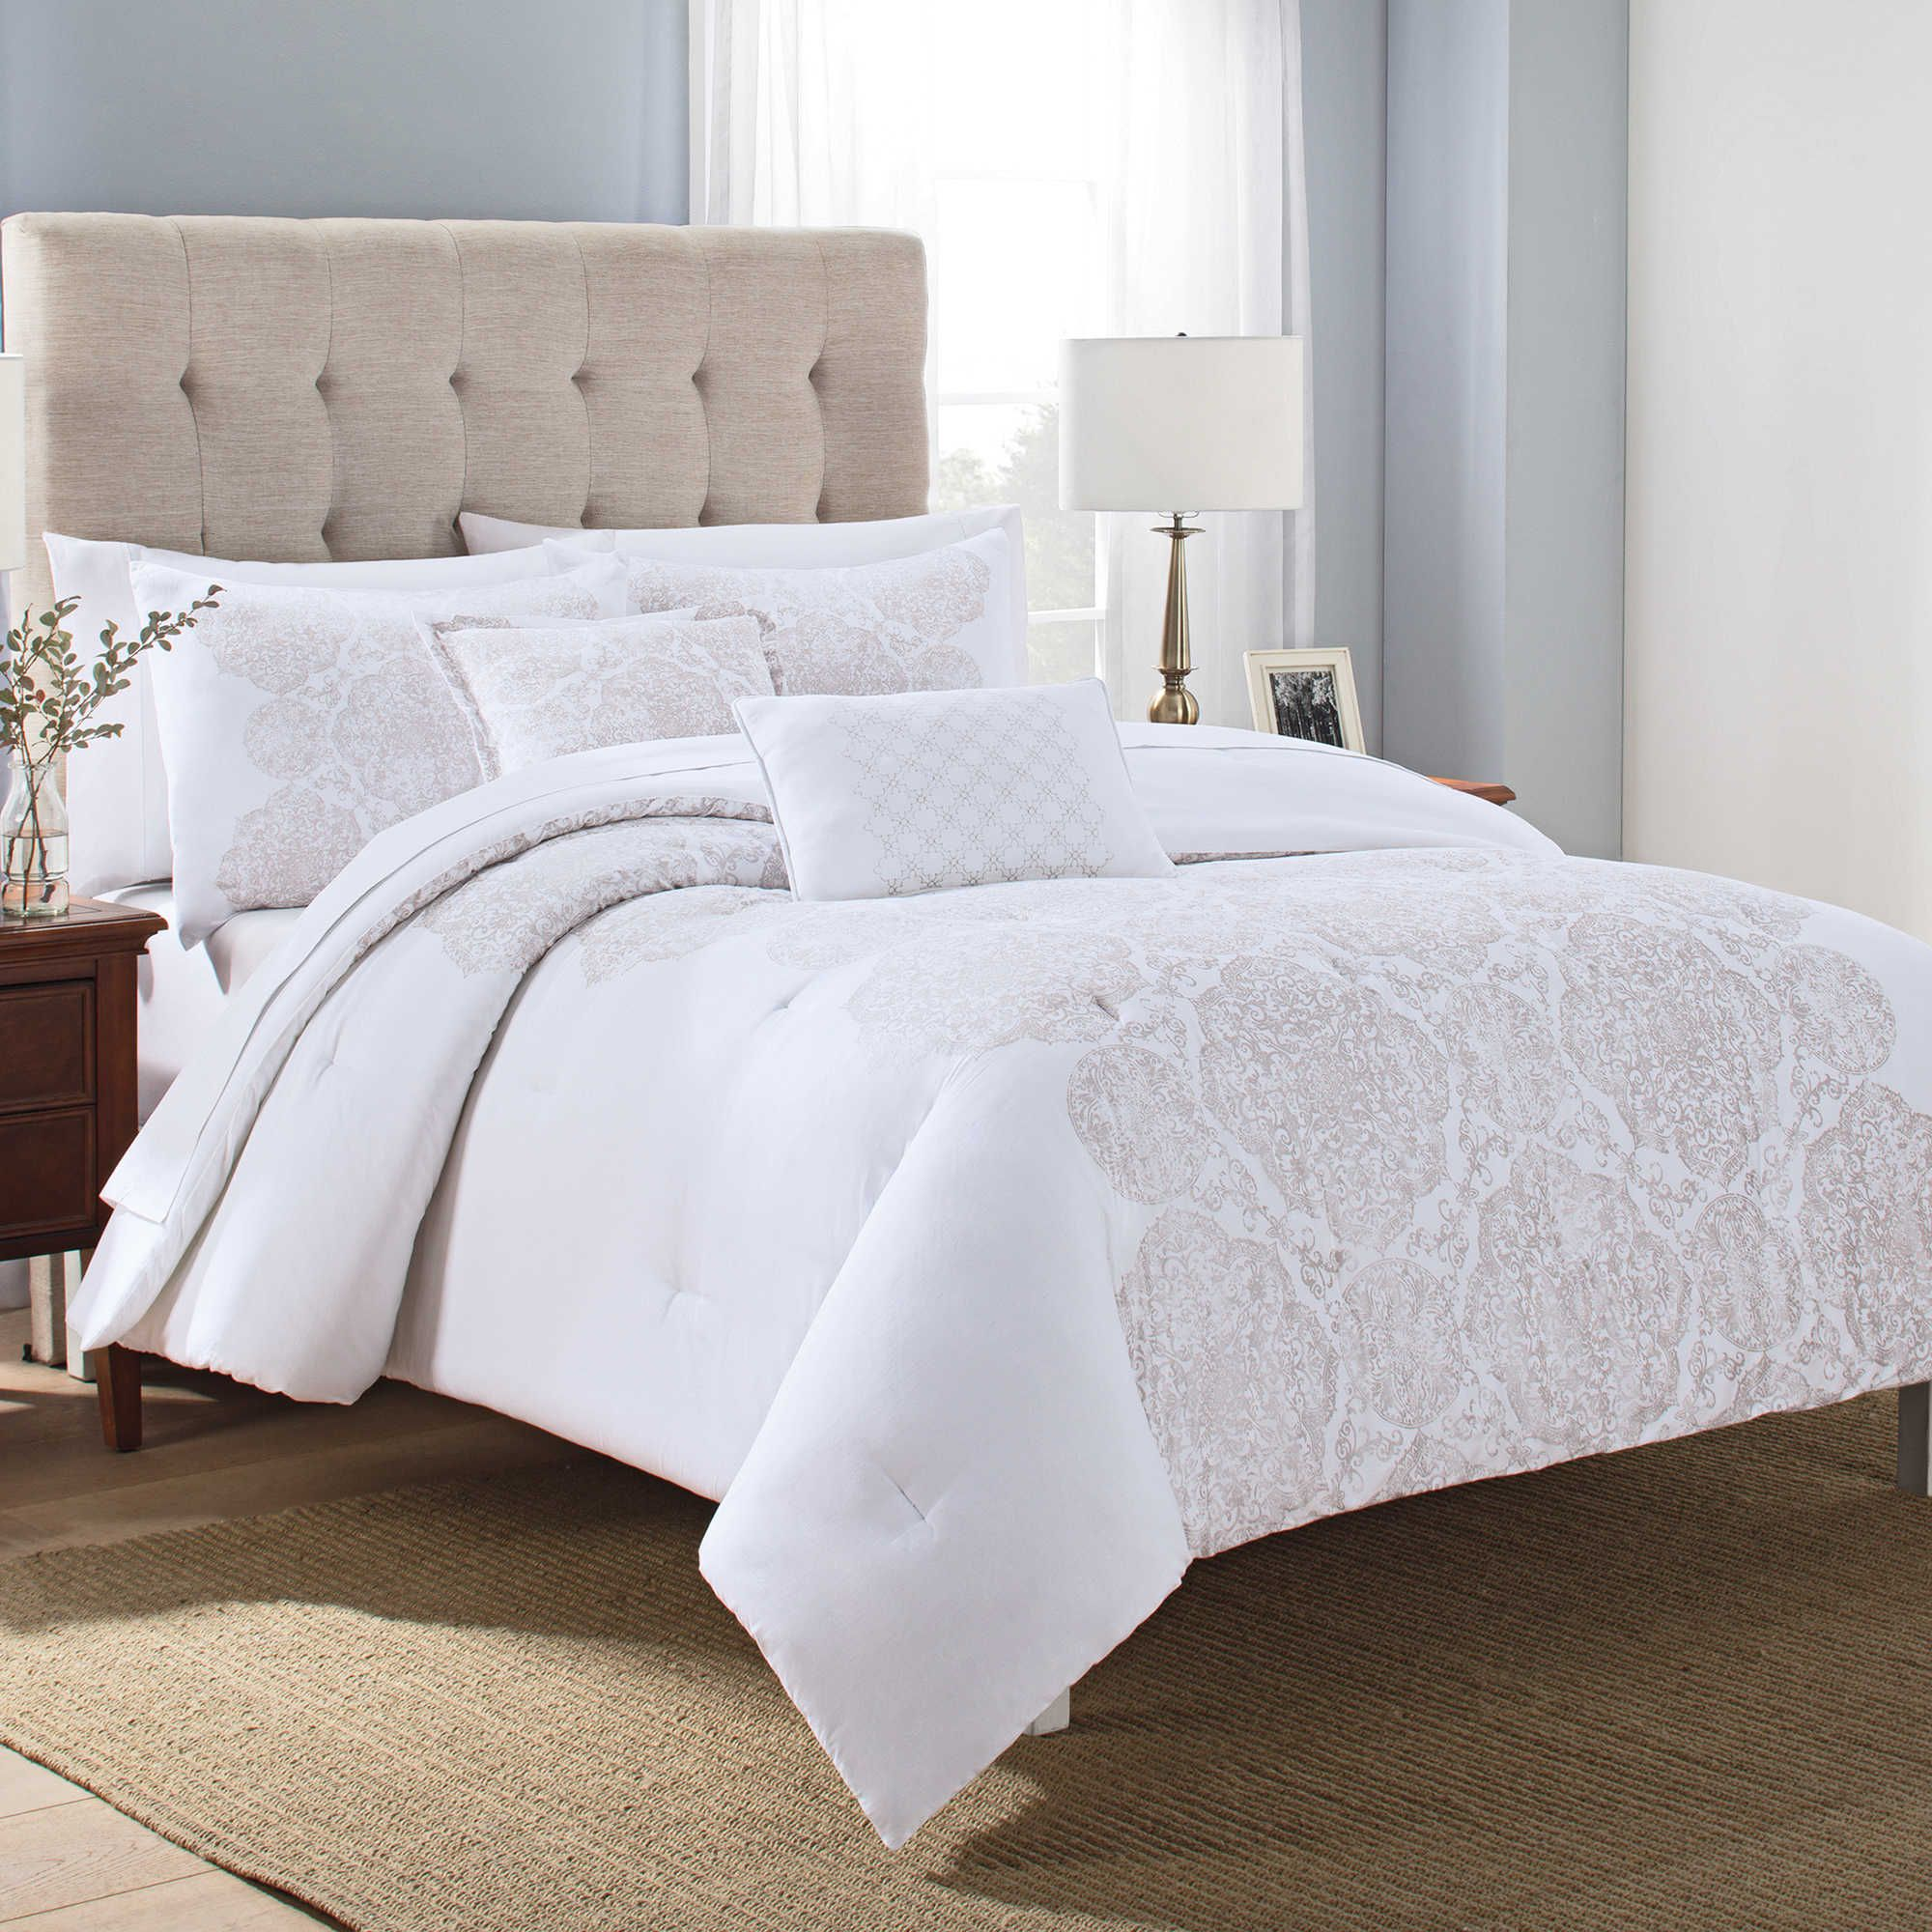 Lilliana 5 Piece Fullqueen Comforter Set In Whitegold Room